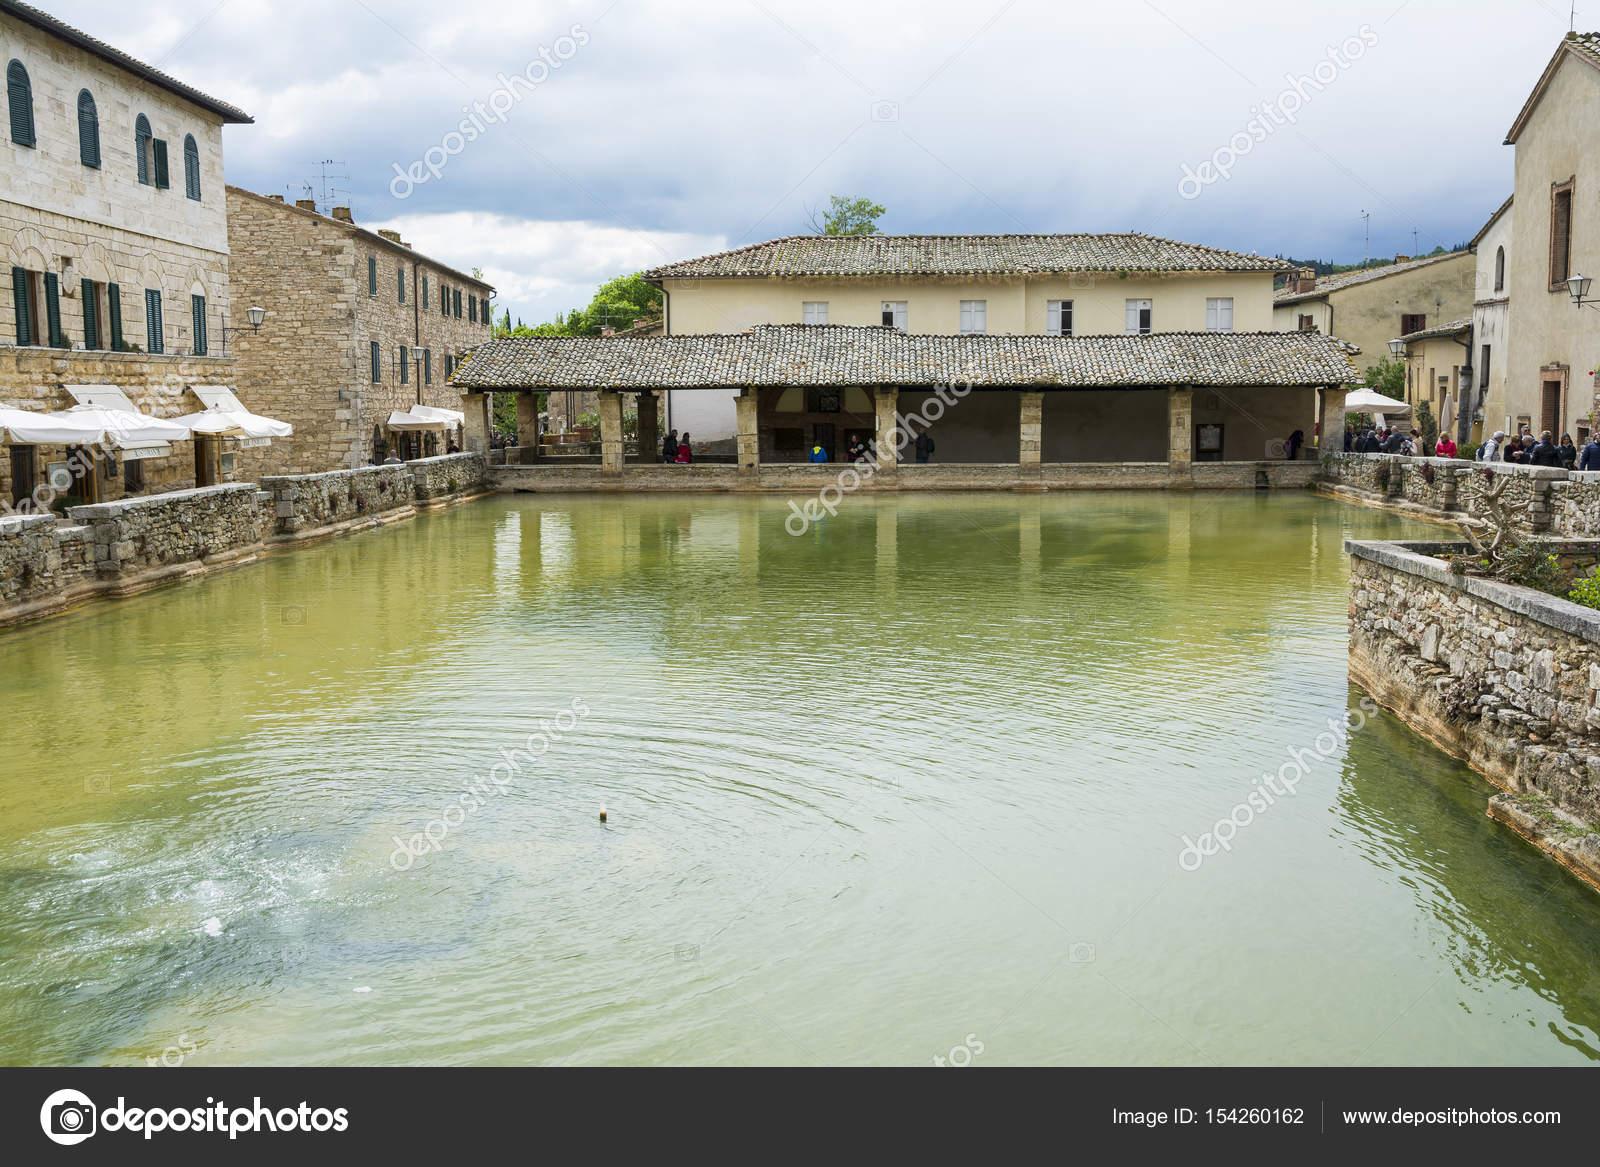 Bagni Vignone in Tuscany – Stock Editorial Photo © starmaro #154260162